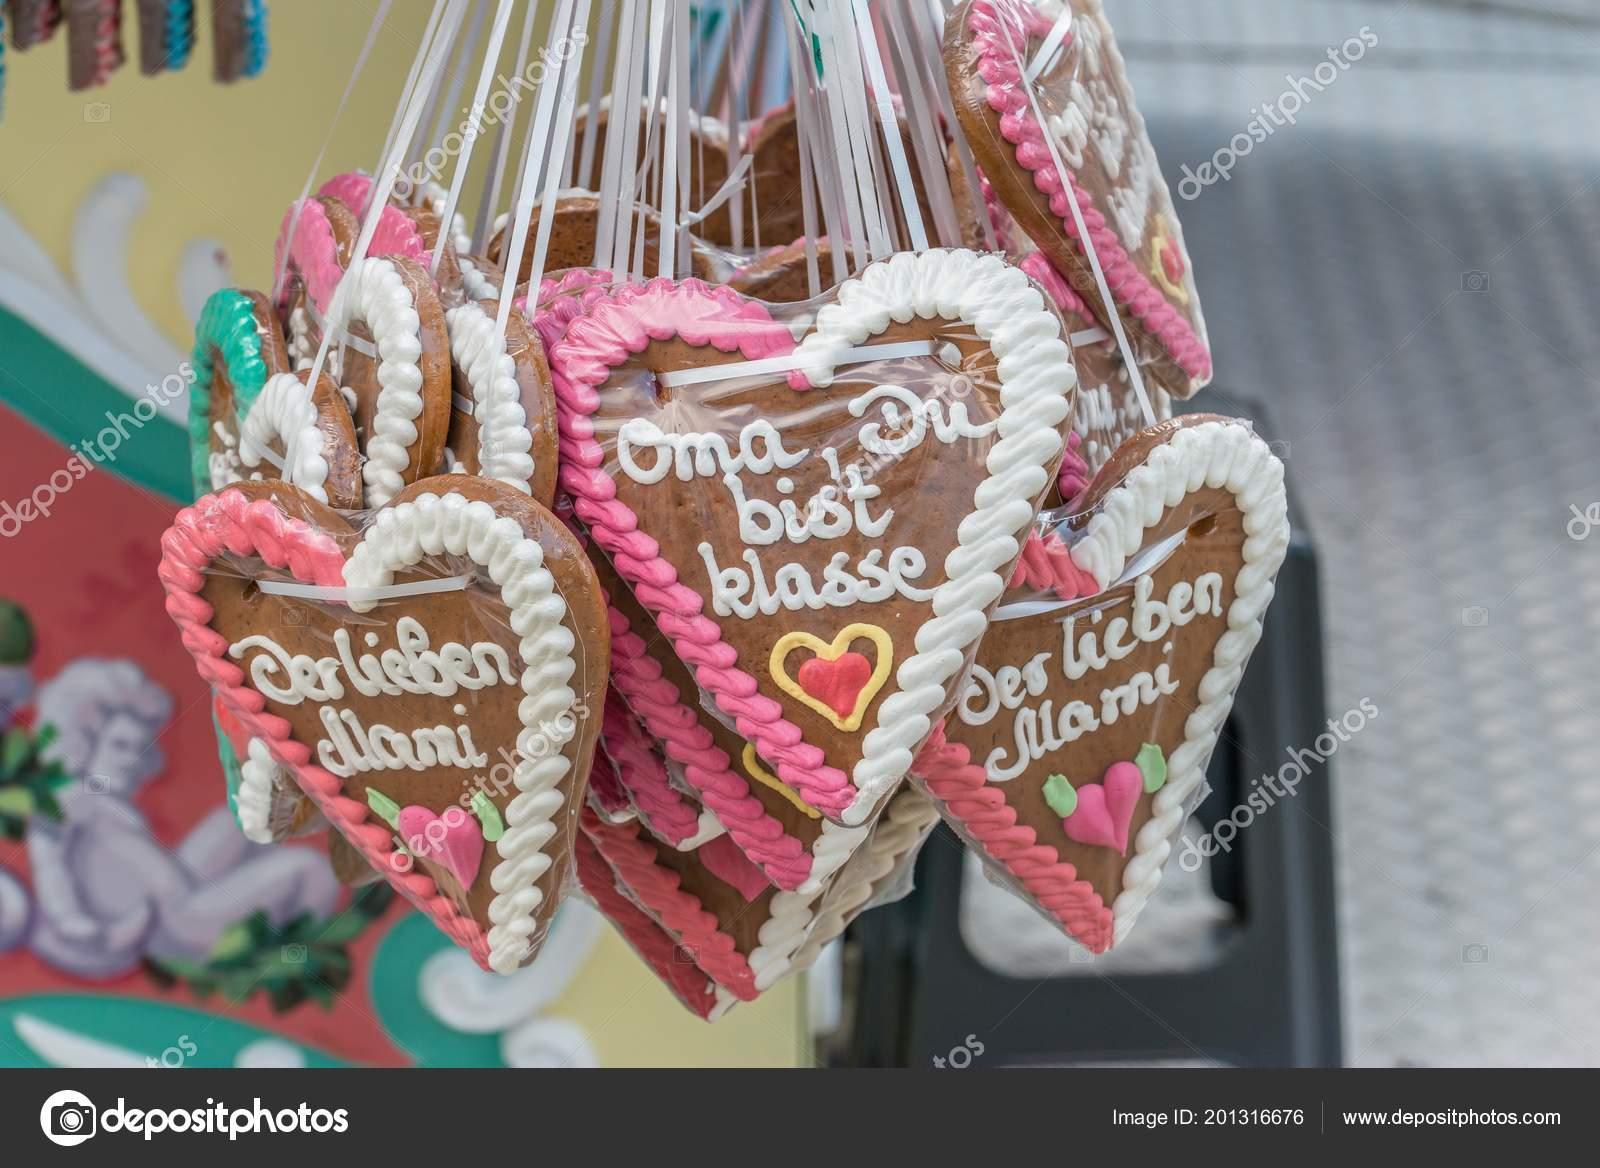 Gingerbread Hearts Folk Festival German Words Grandma You Great